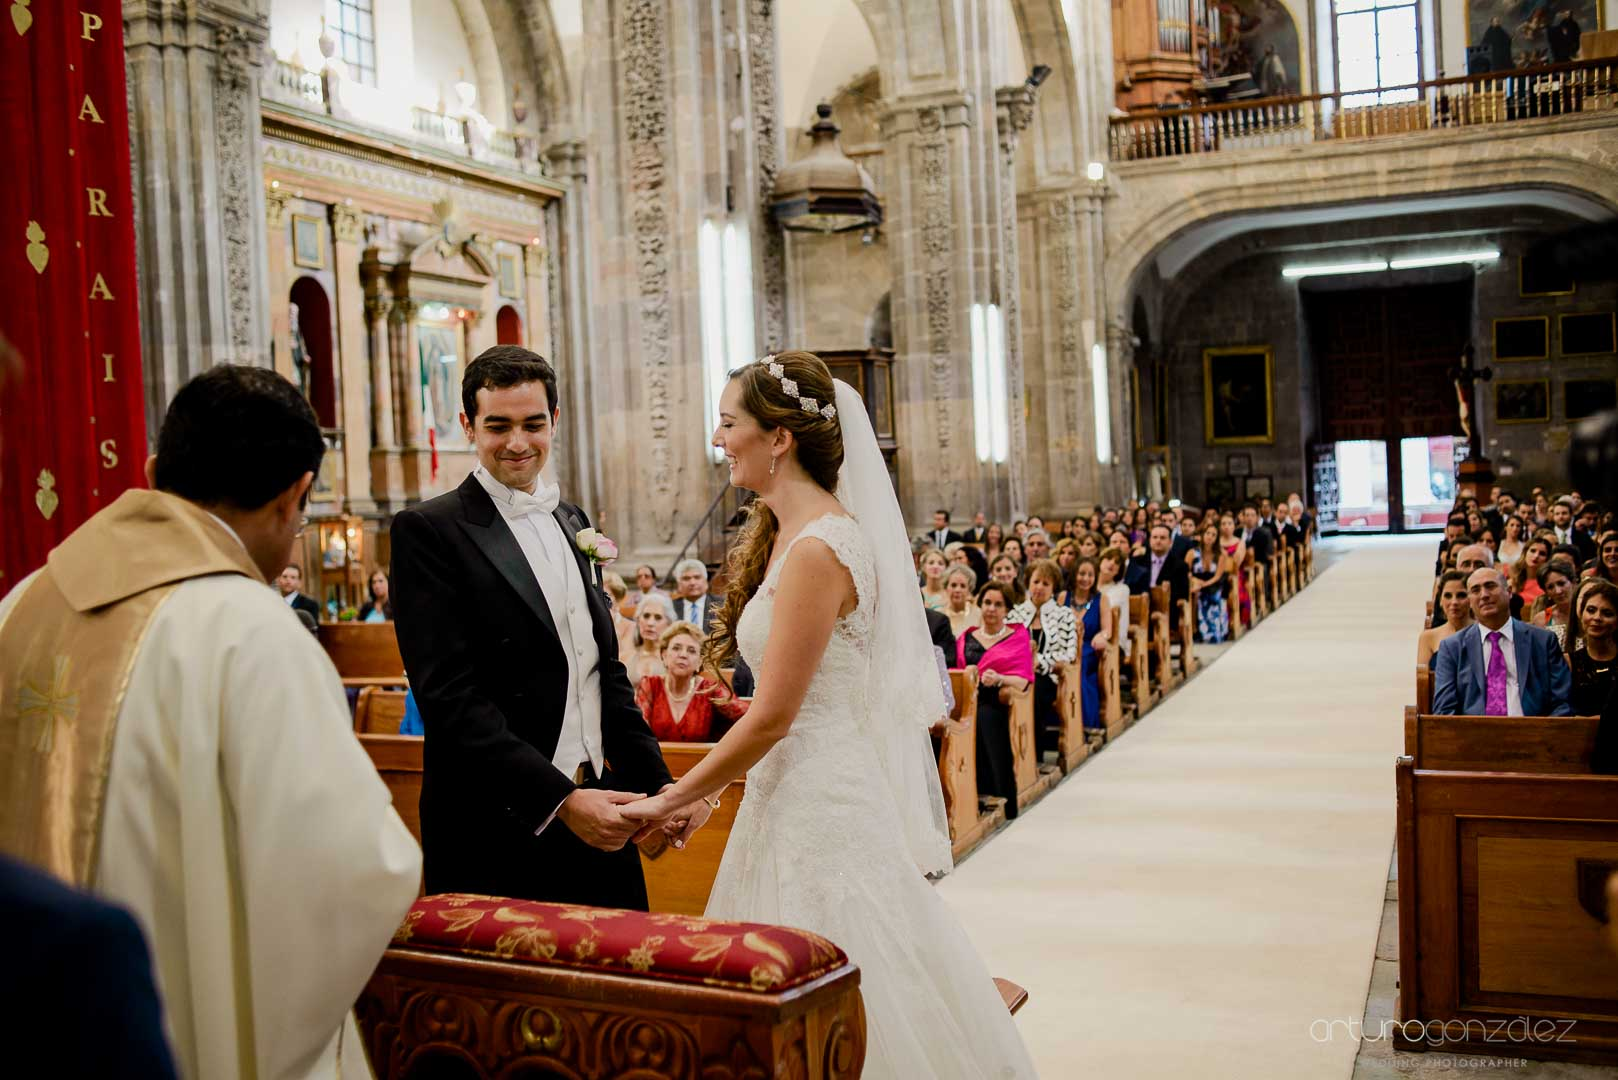 fotografo-de-bodas-en-guanajuato-73